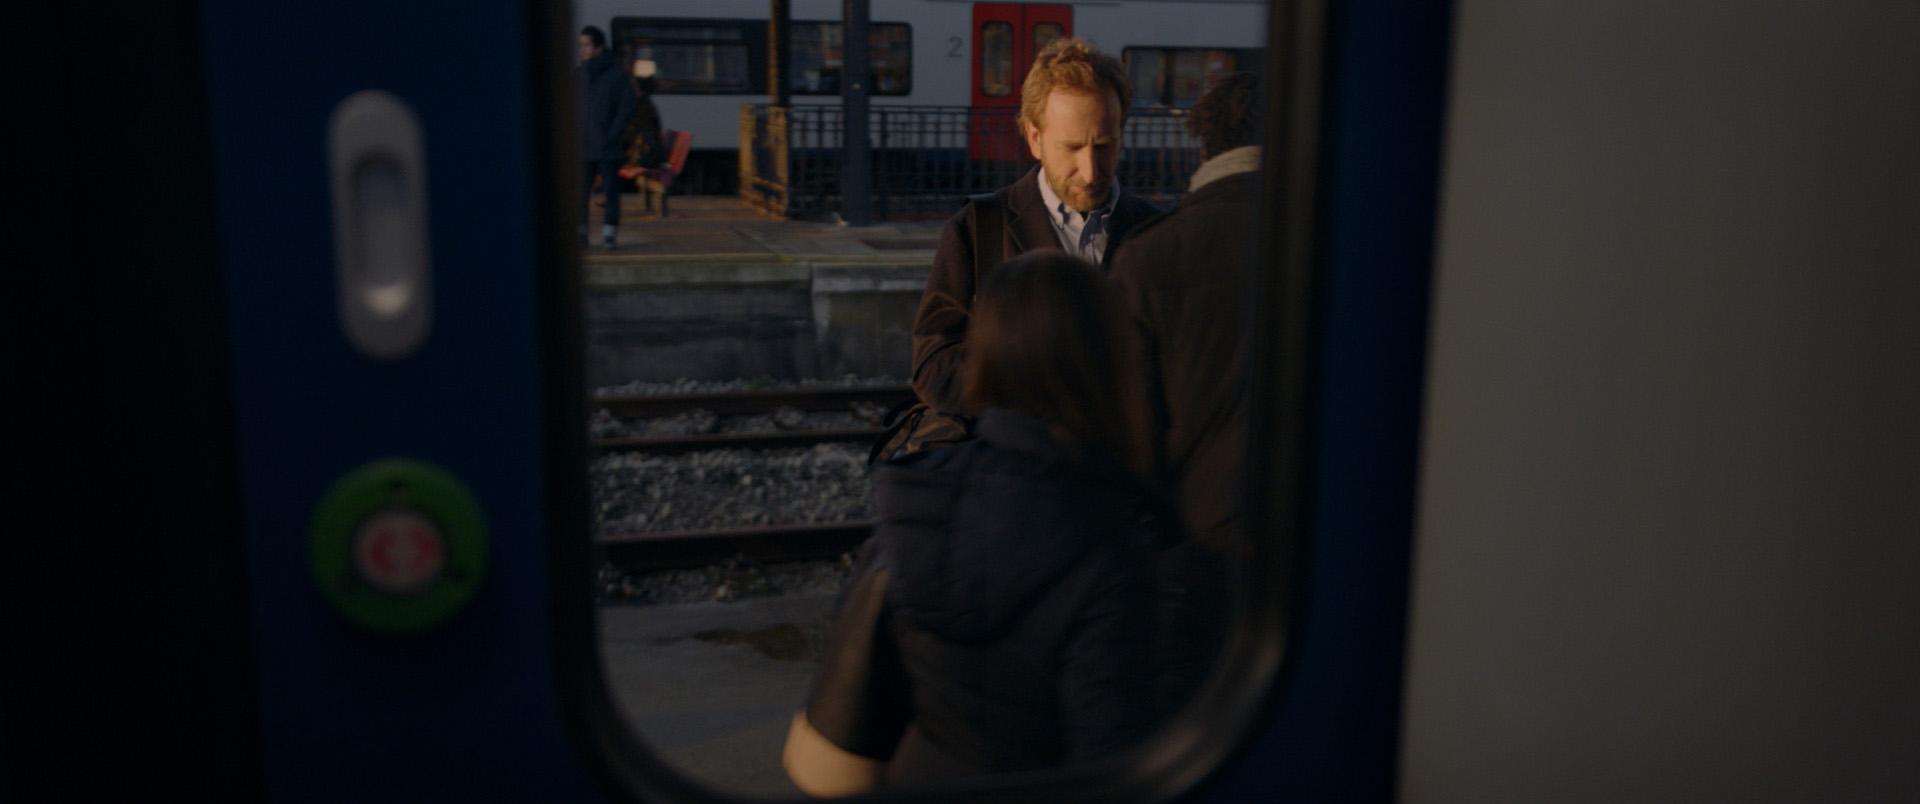 peu_prom_trainstation_30s_VF_web_v030_mix_open-0549